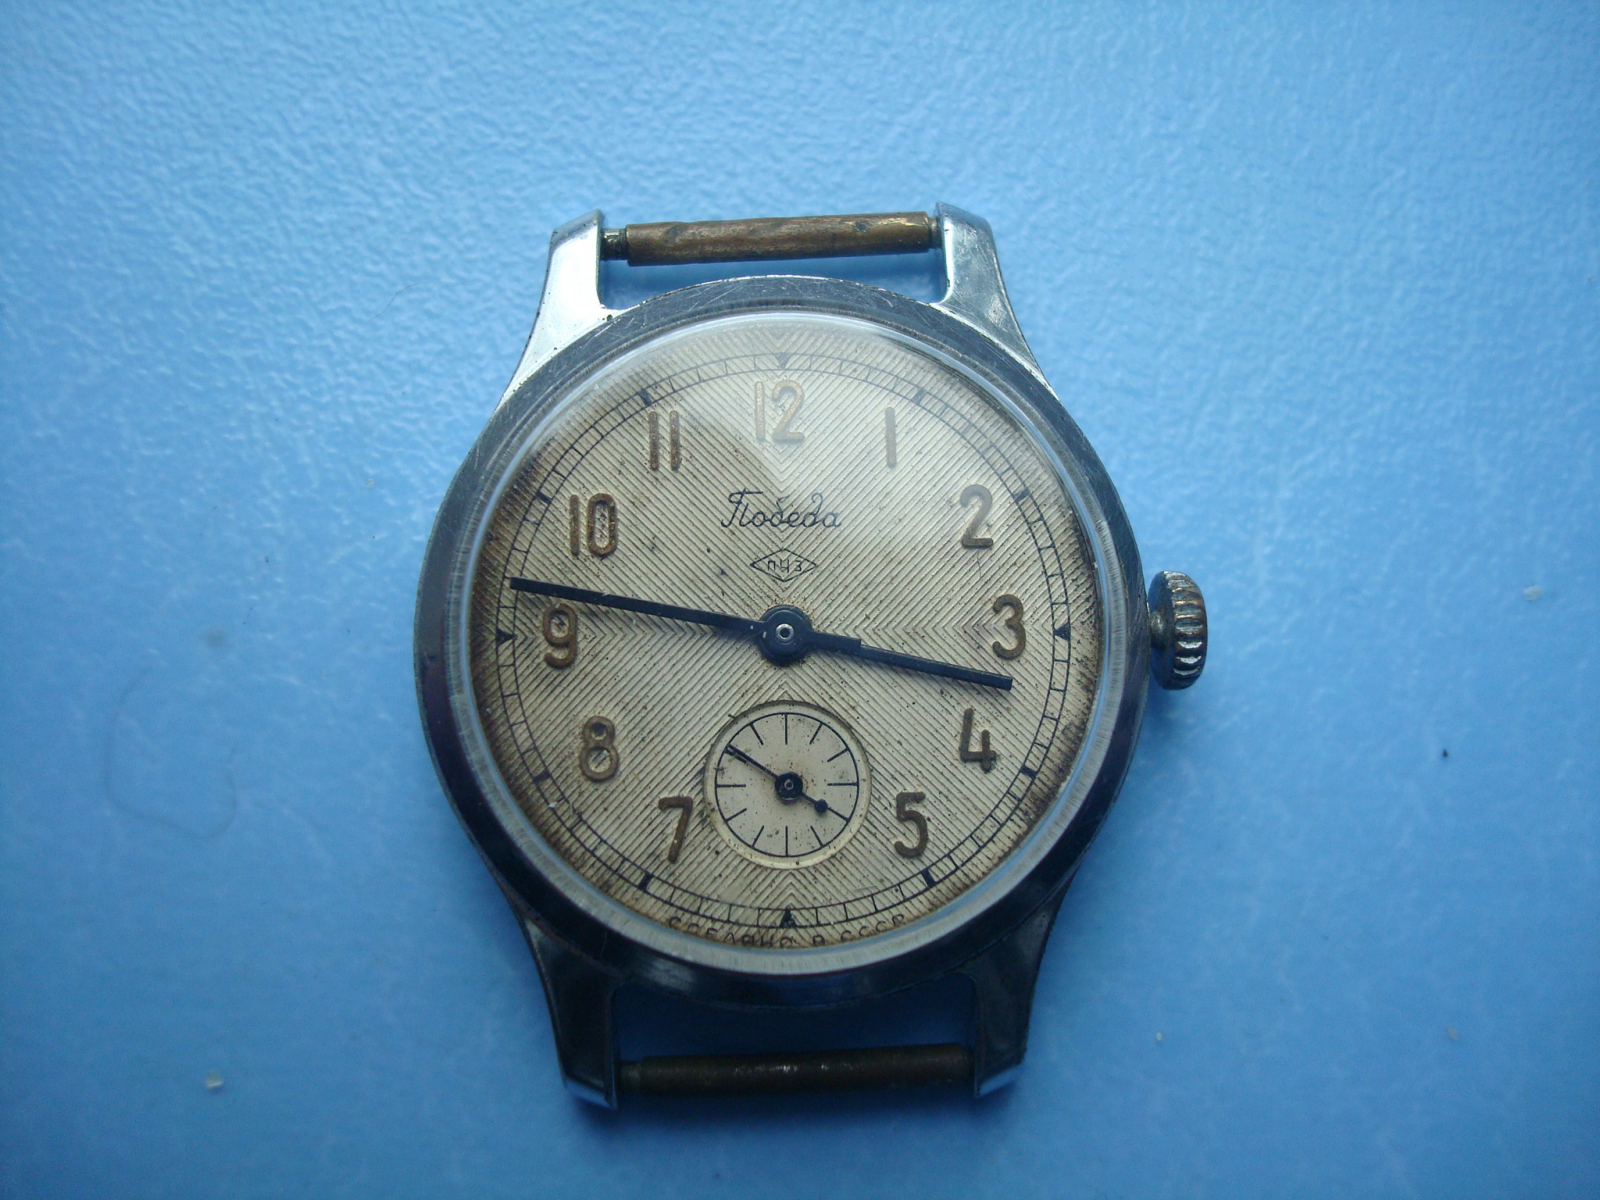 Аукцион купить часы часы наручные мужские статусы